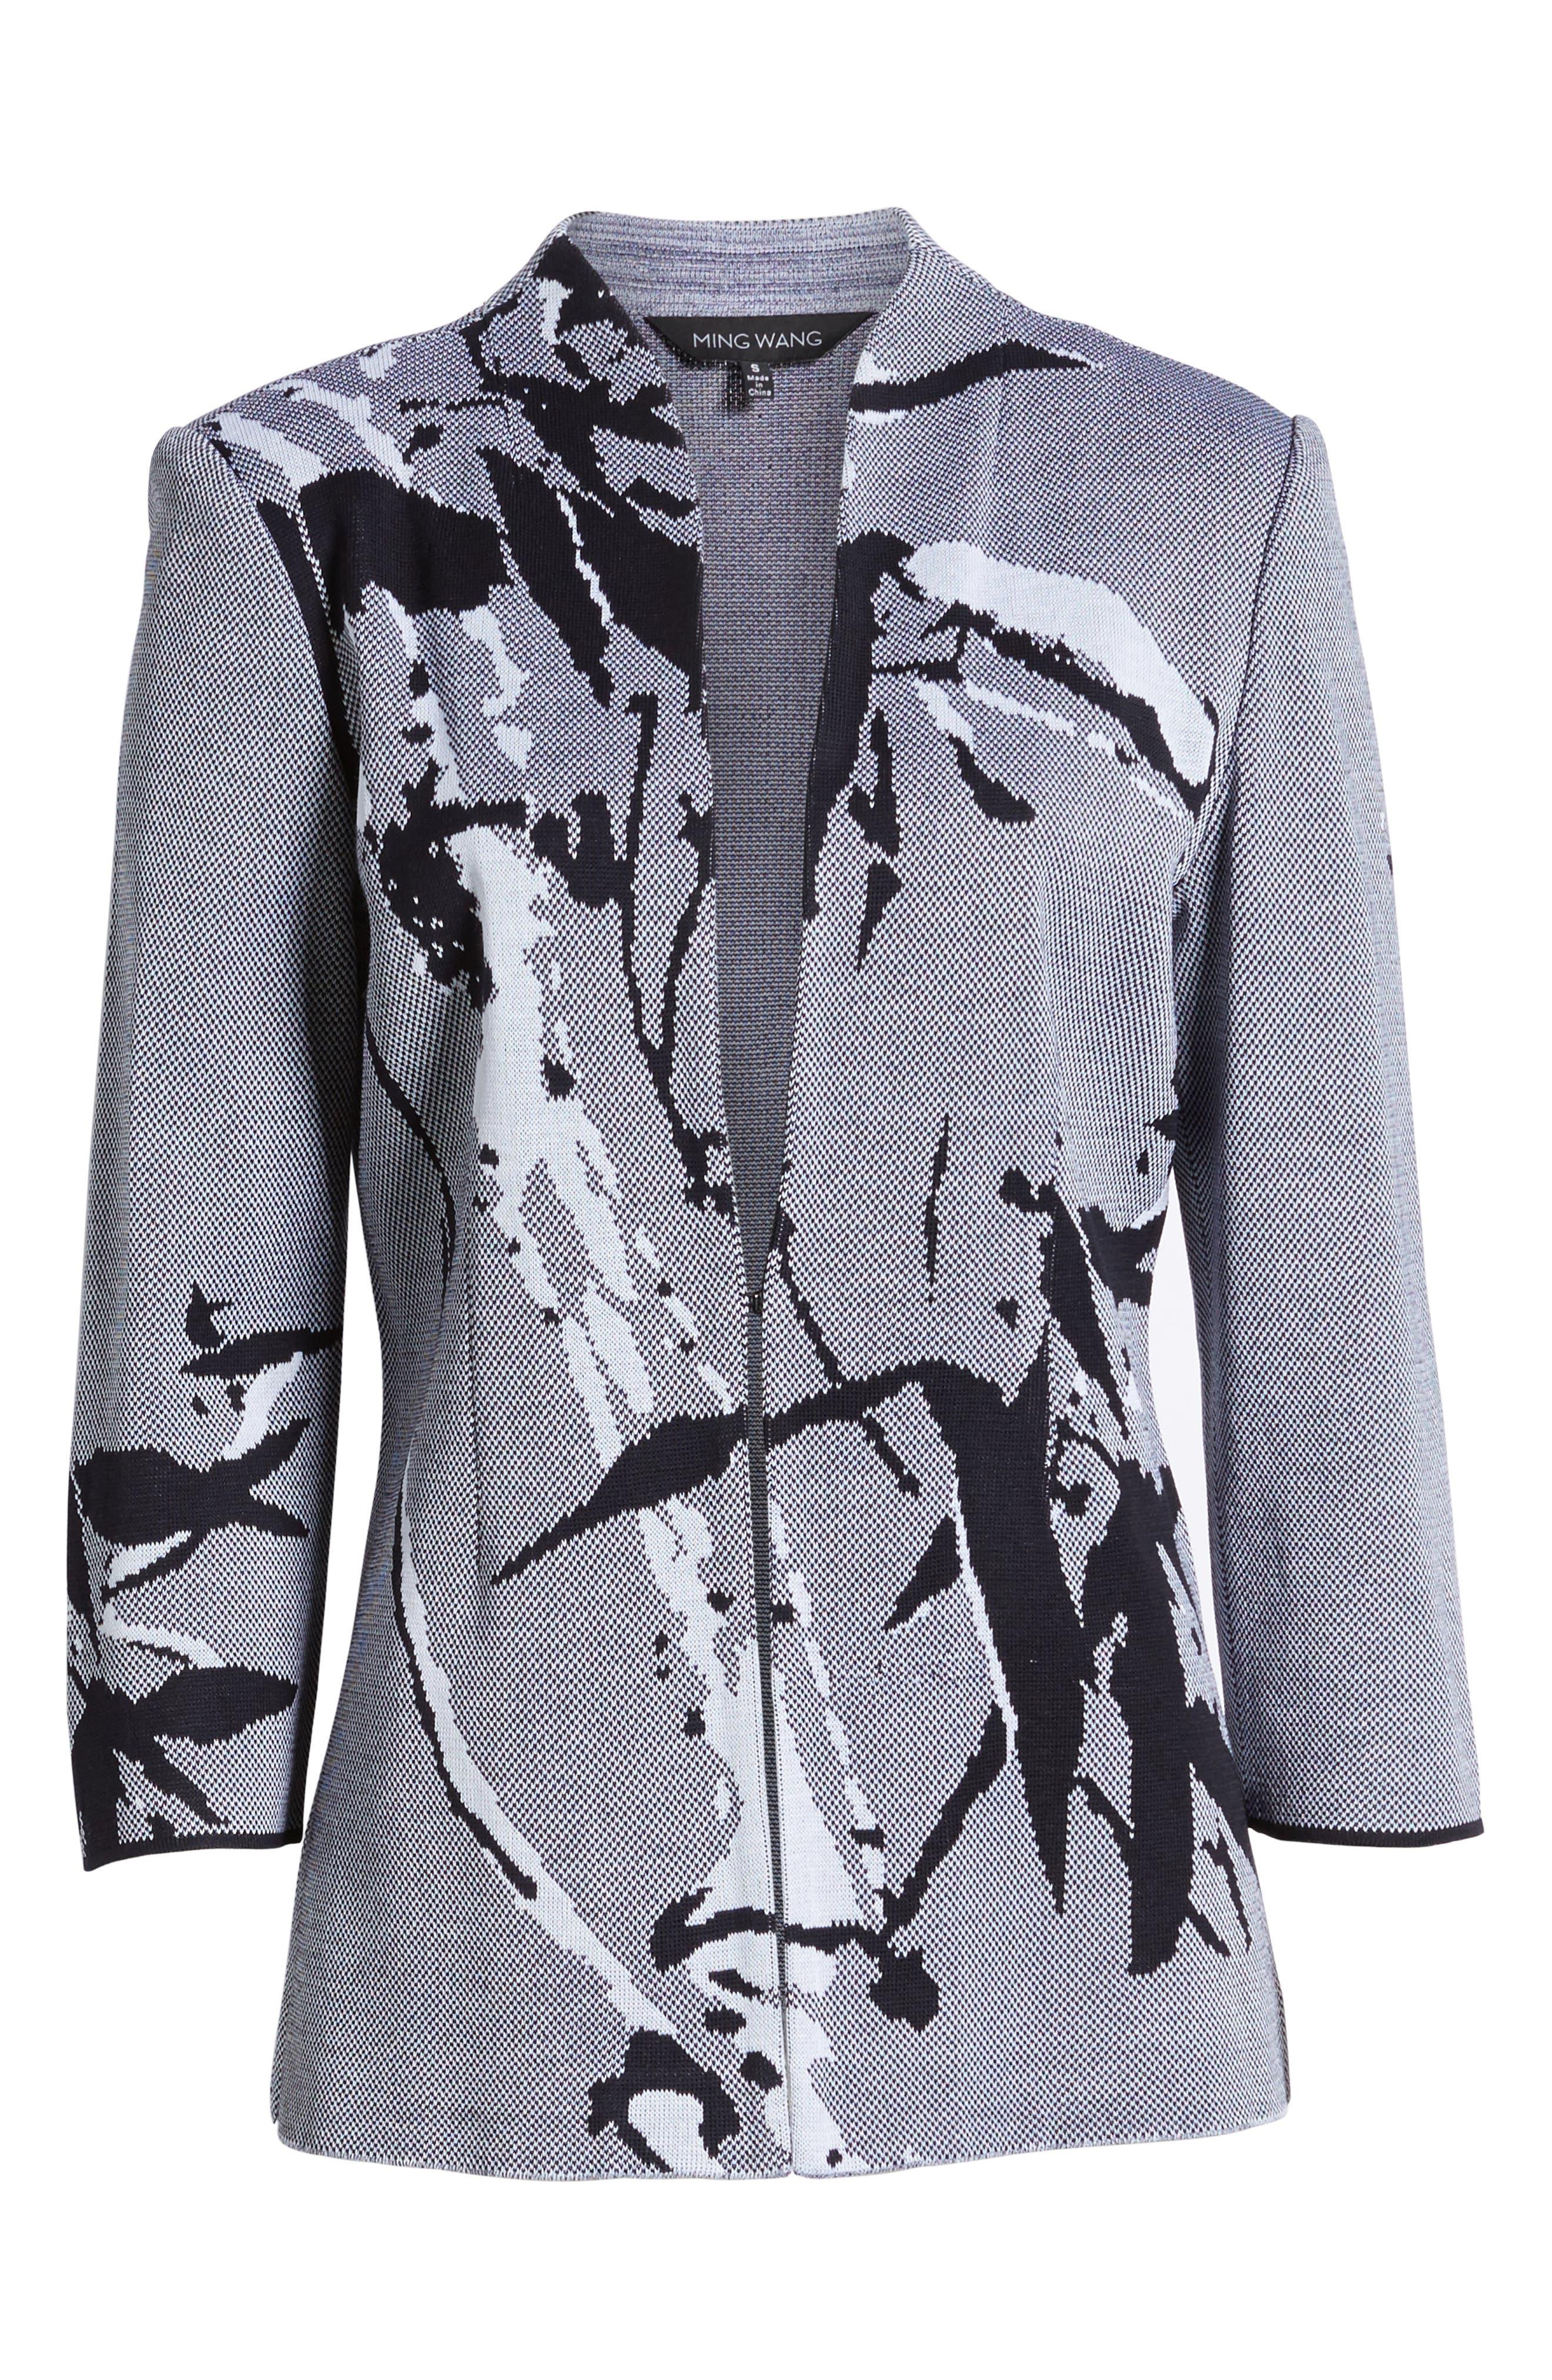 Abstract Jacquard Jacket,                             Alternate thumbnail 5, color,                             419